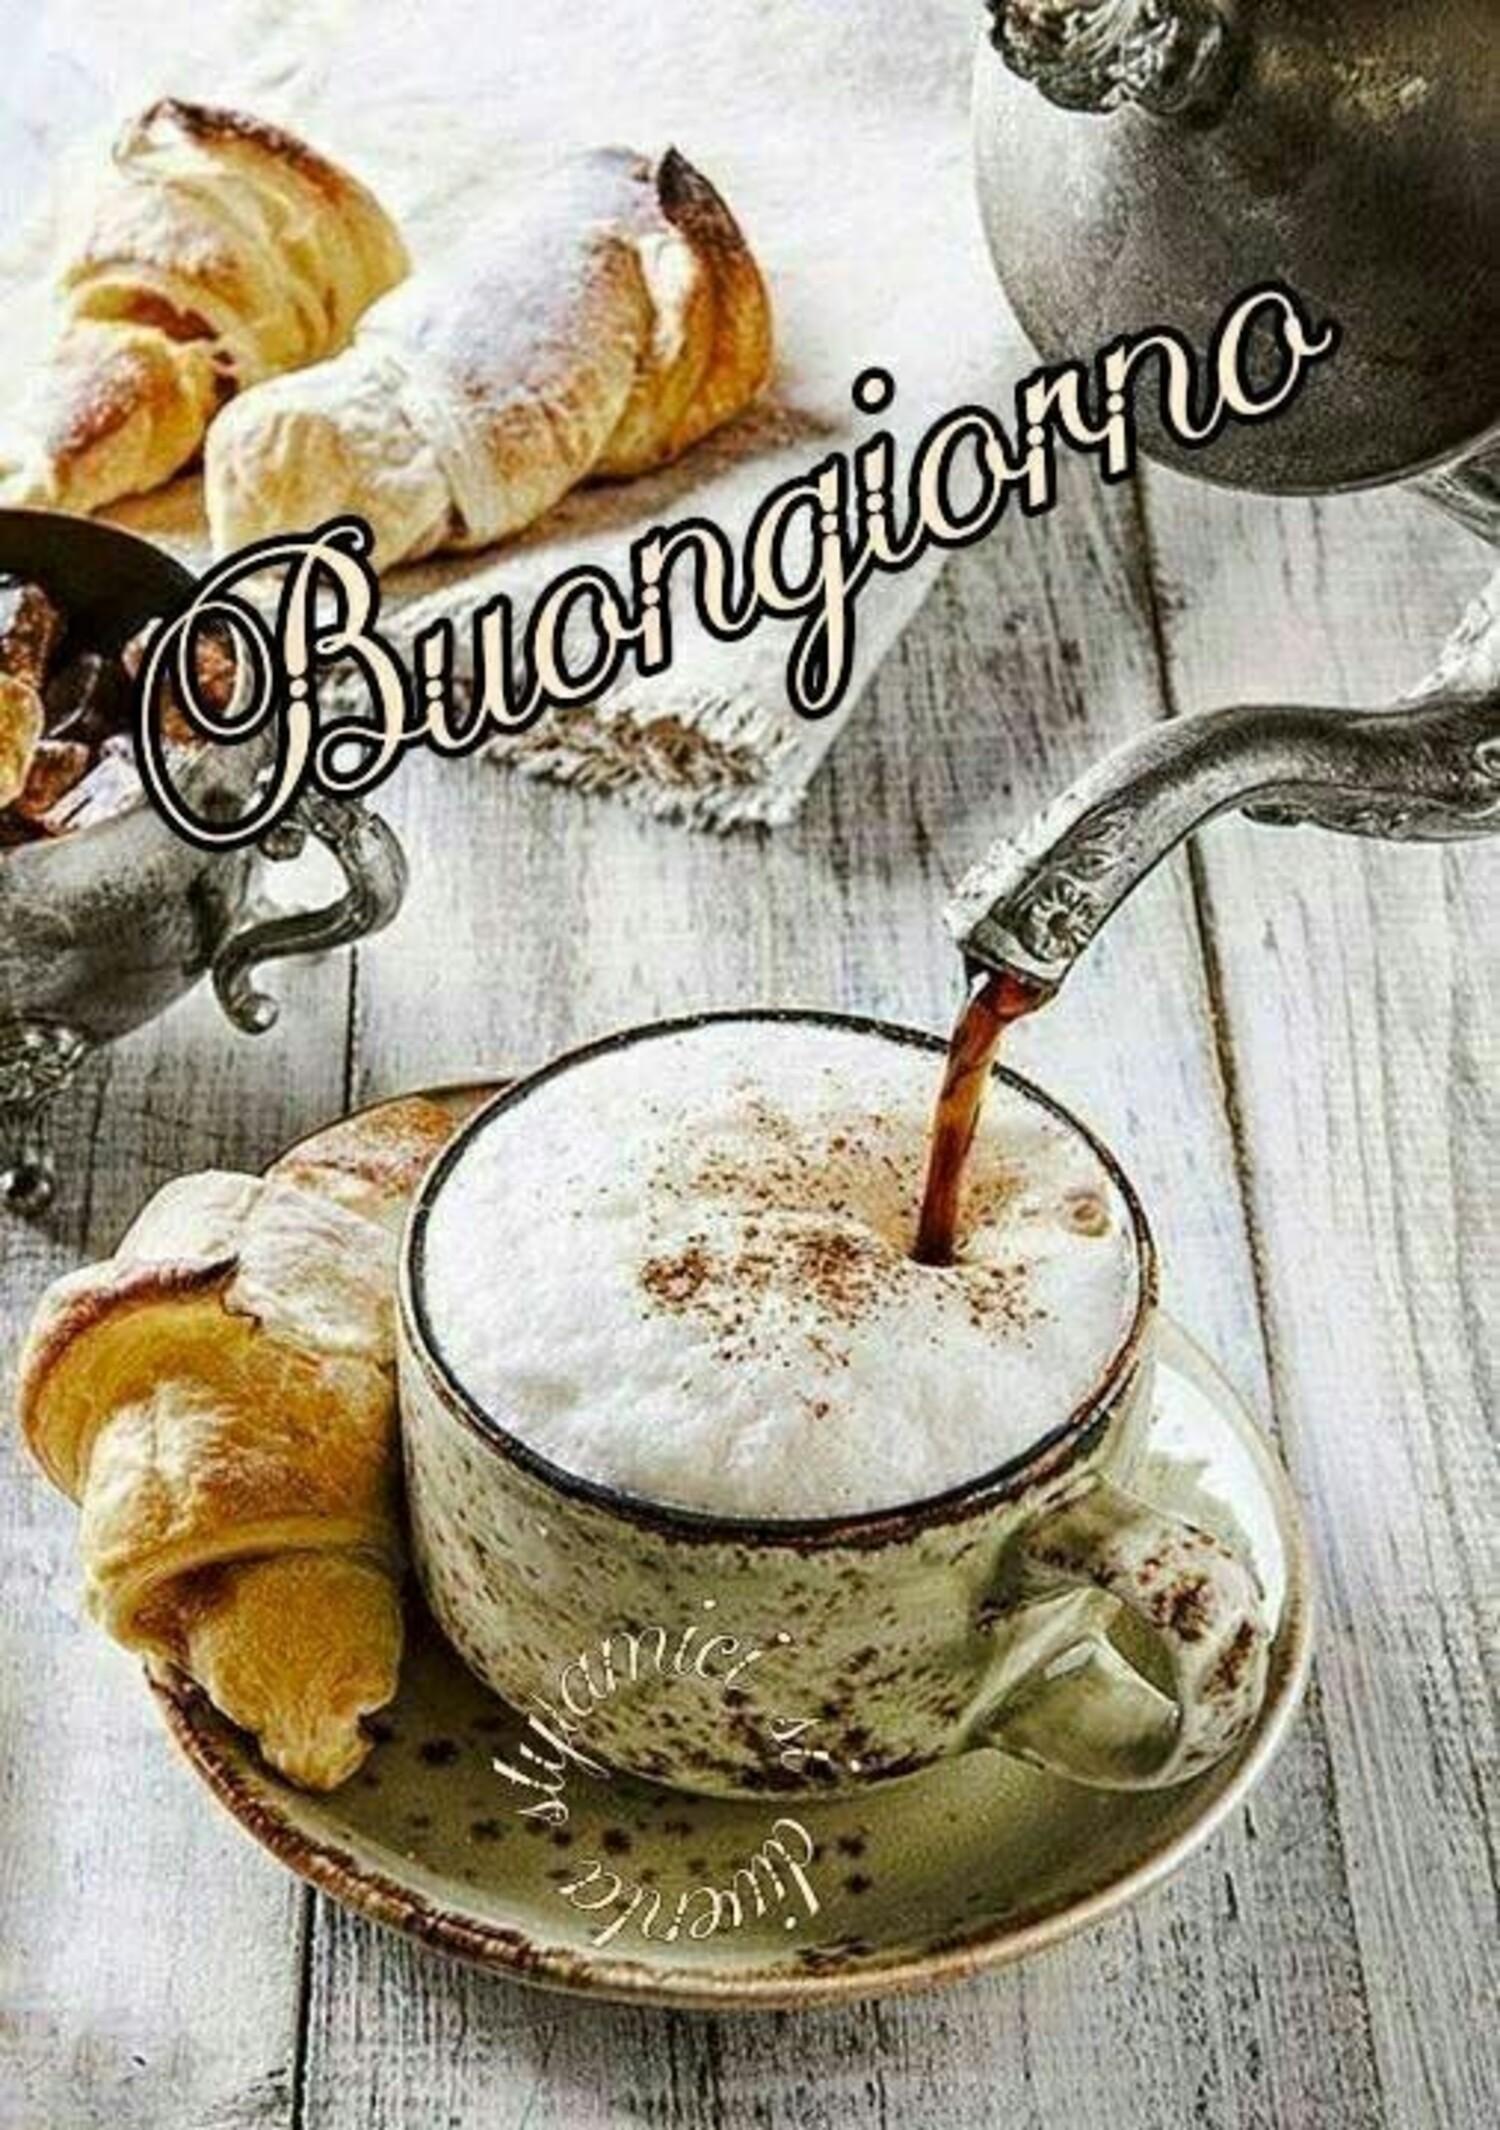 Buona Giornata, caffè?